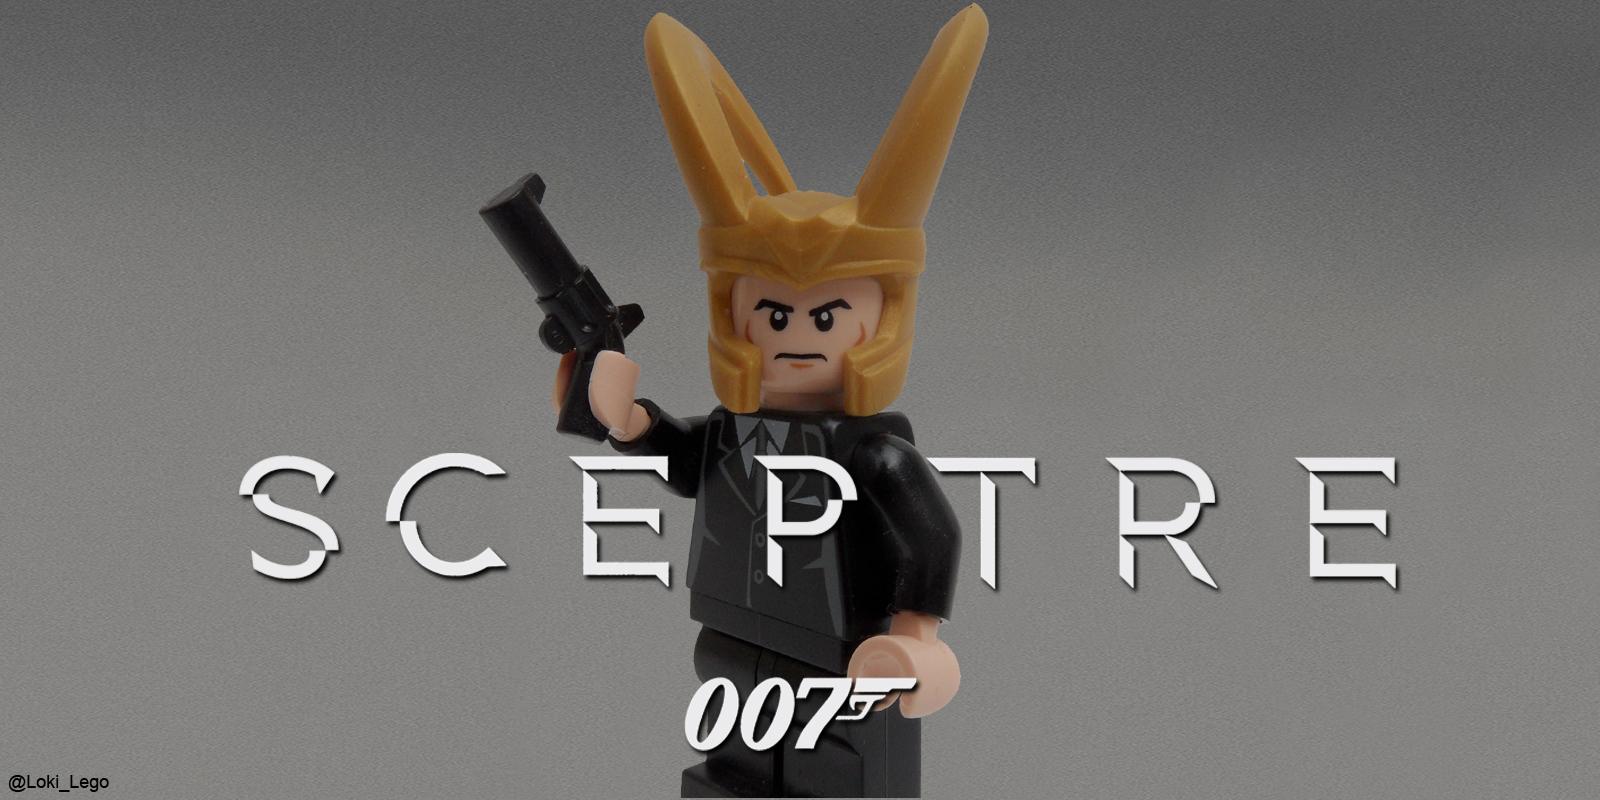 James-Bond-Sceptre-poster